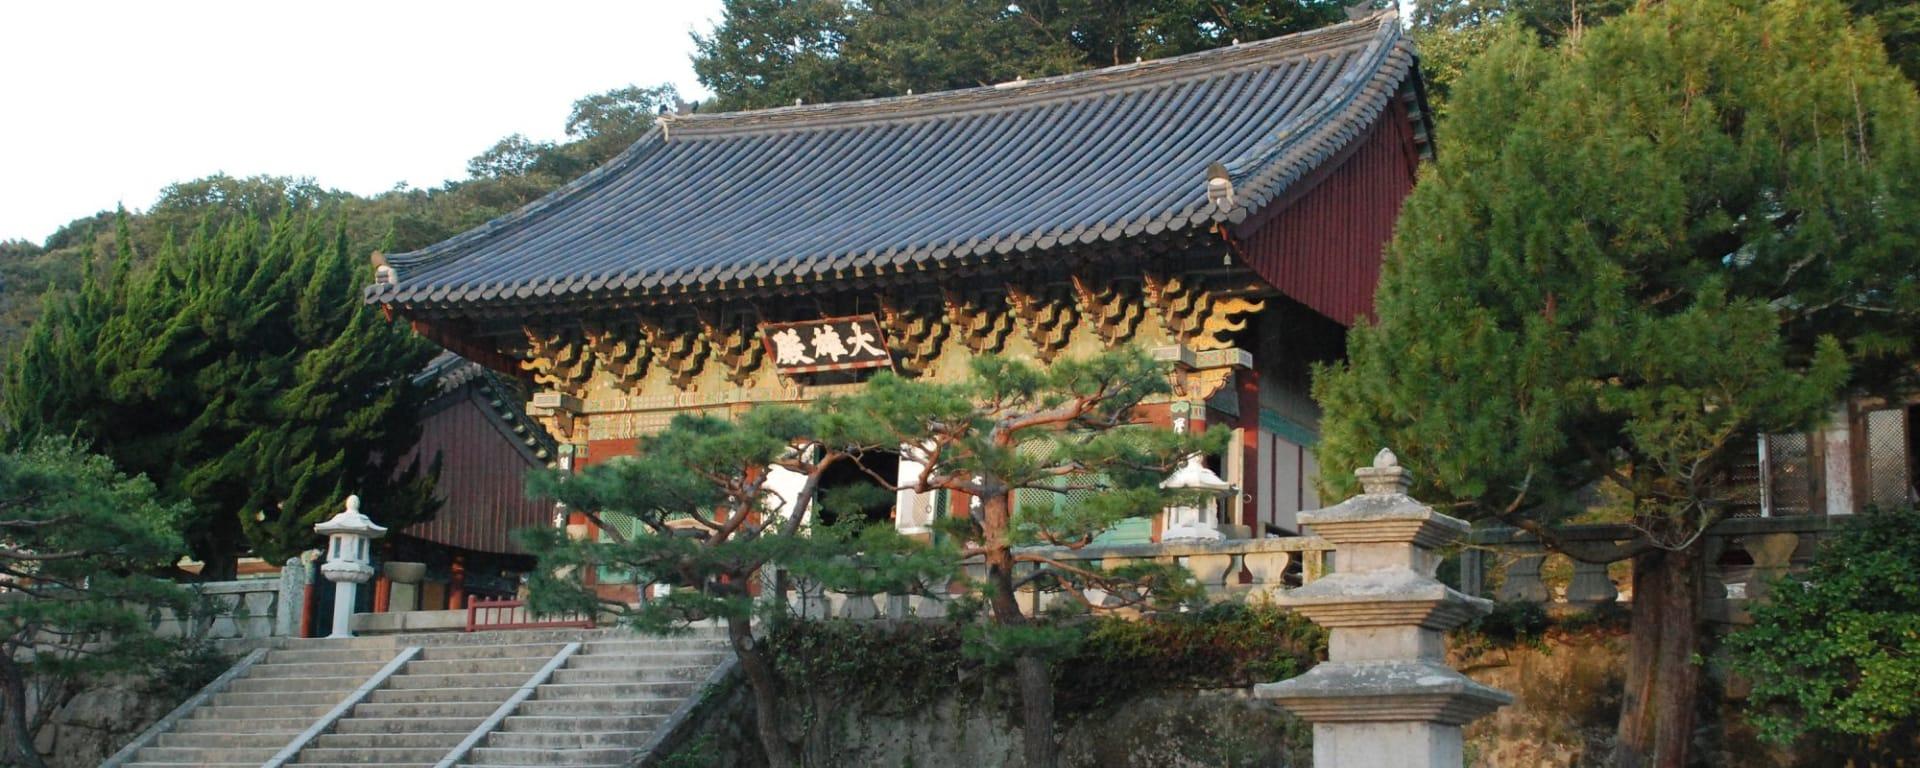 Temple Stay de Busan: Beomeosa Temple 04 (Busan)